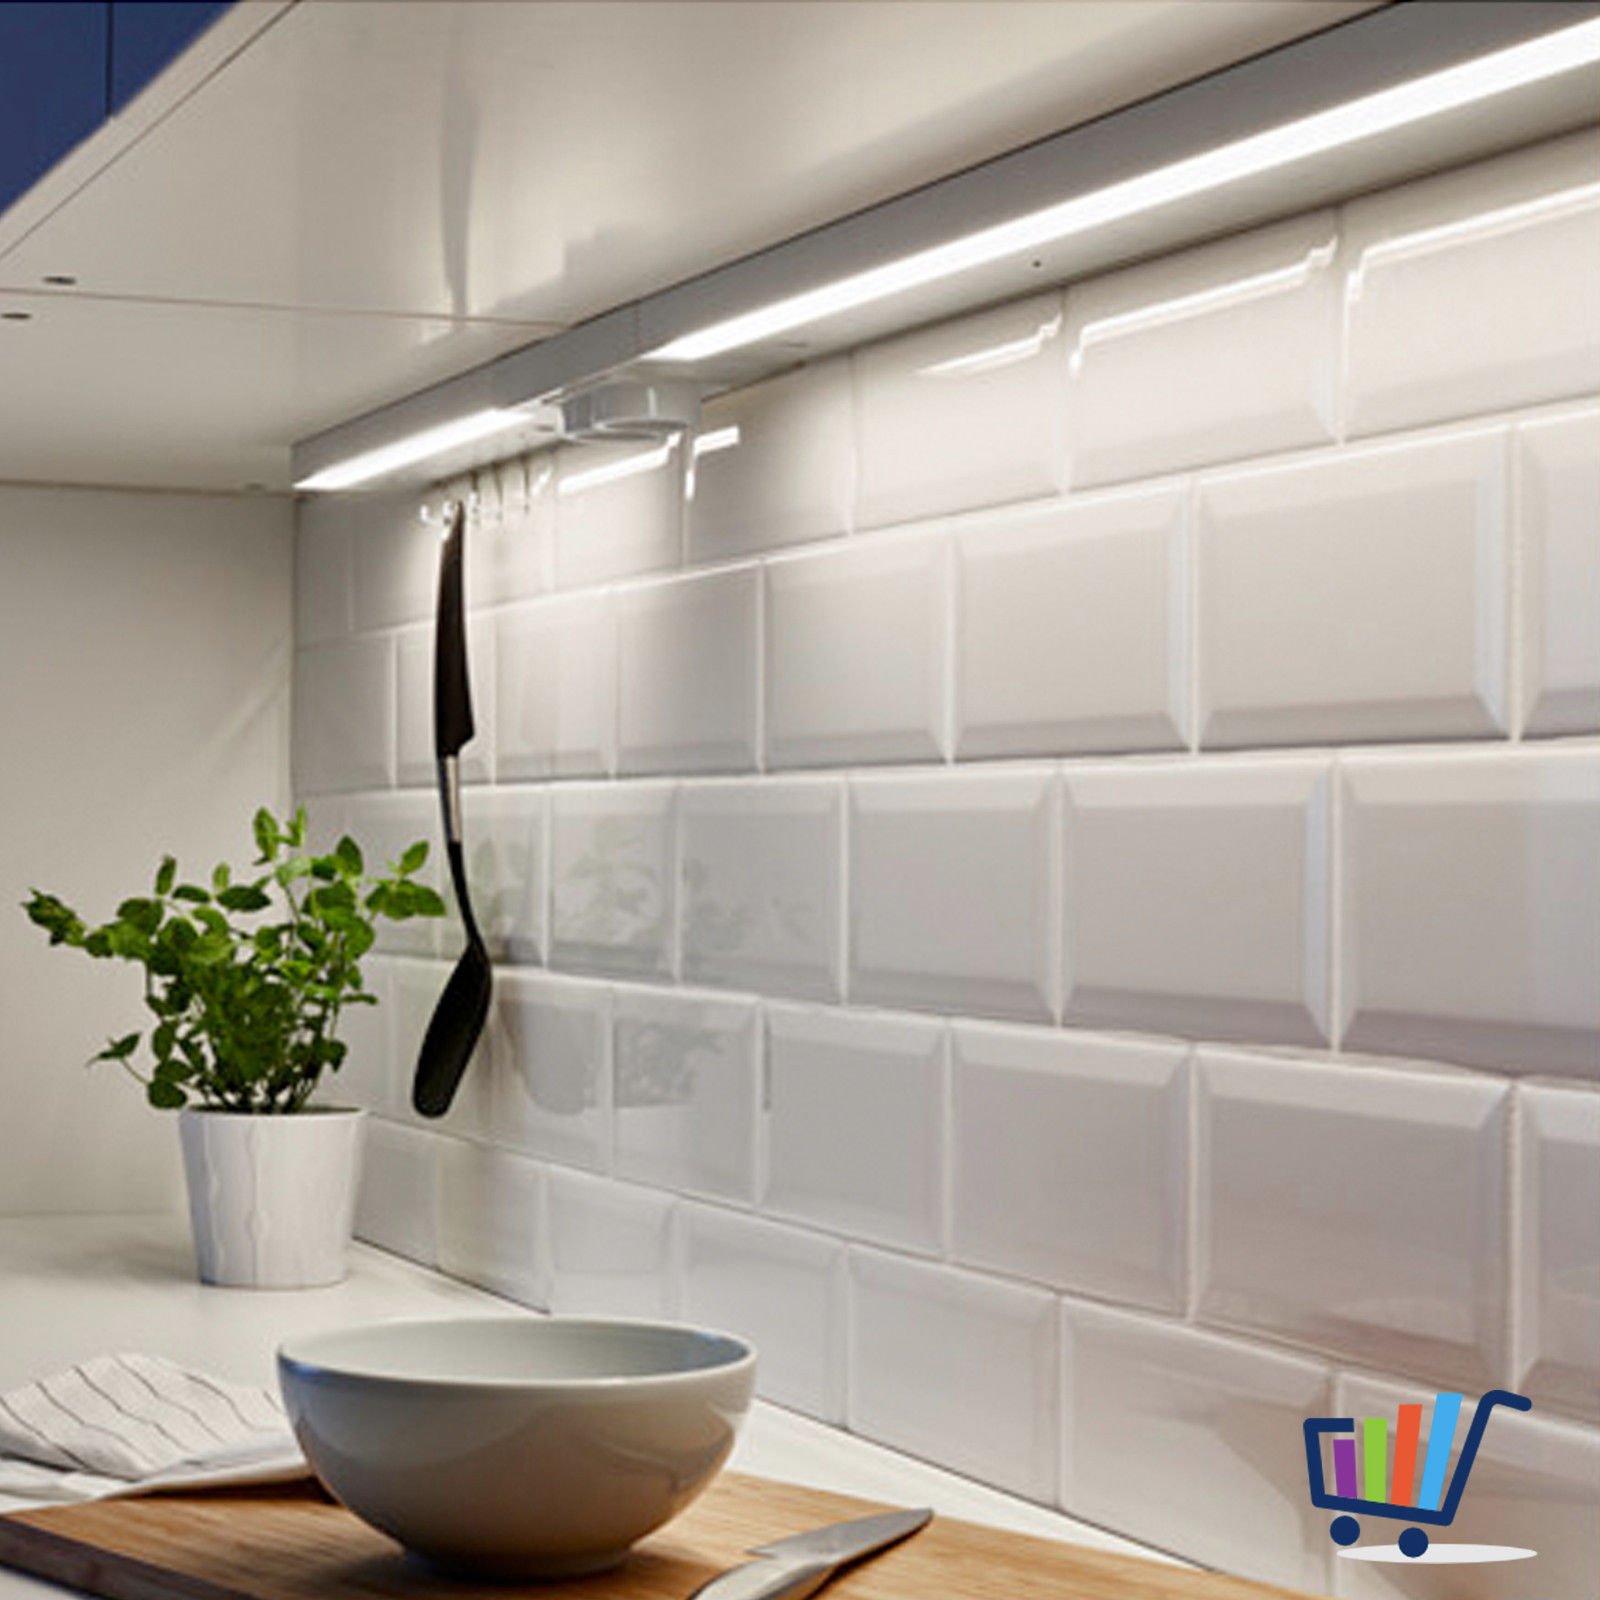 ikea utrusta lichtleiste arbeitsleuchte k chen led beleuchtung 80cm dimmbar neu traumfabrik xxl. Black Bedroom Furniture Sets. Home Design Ideas